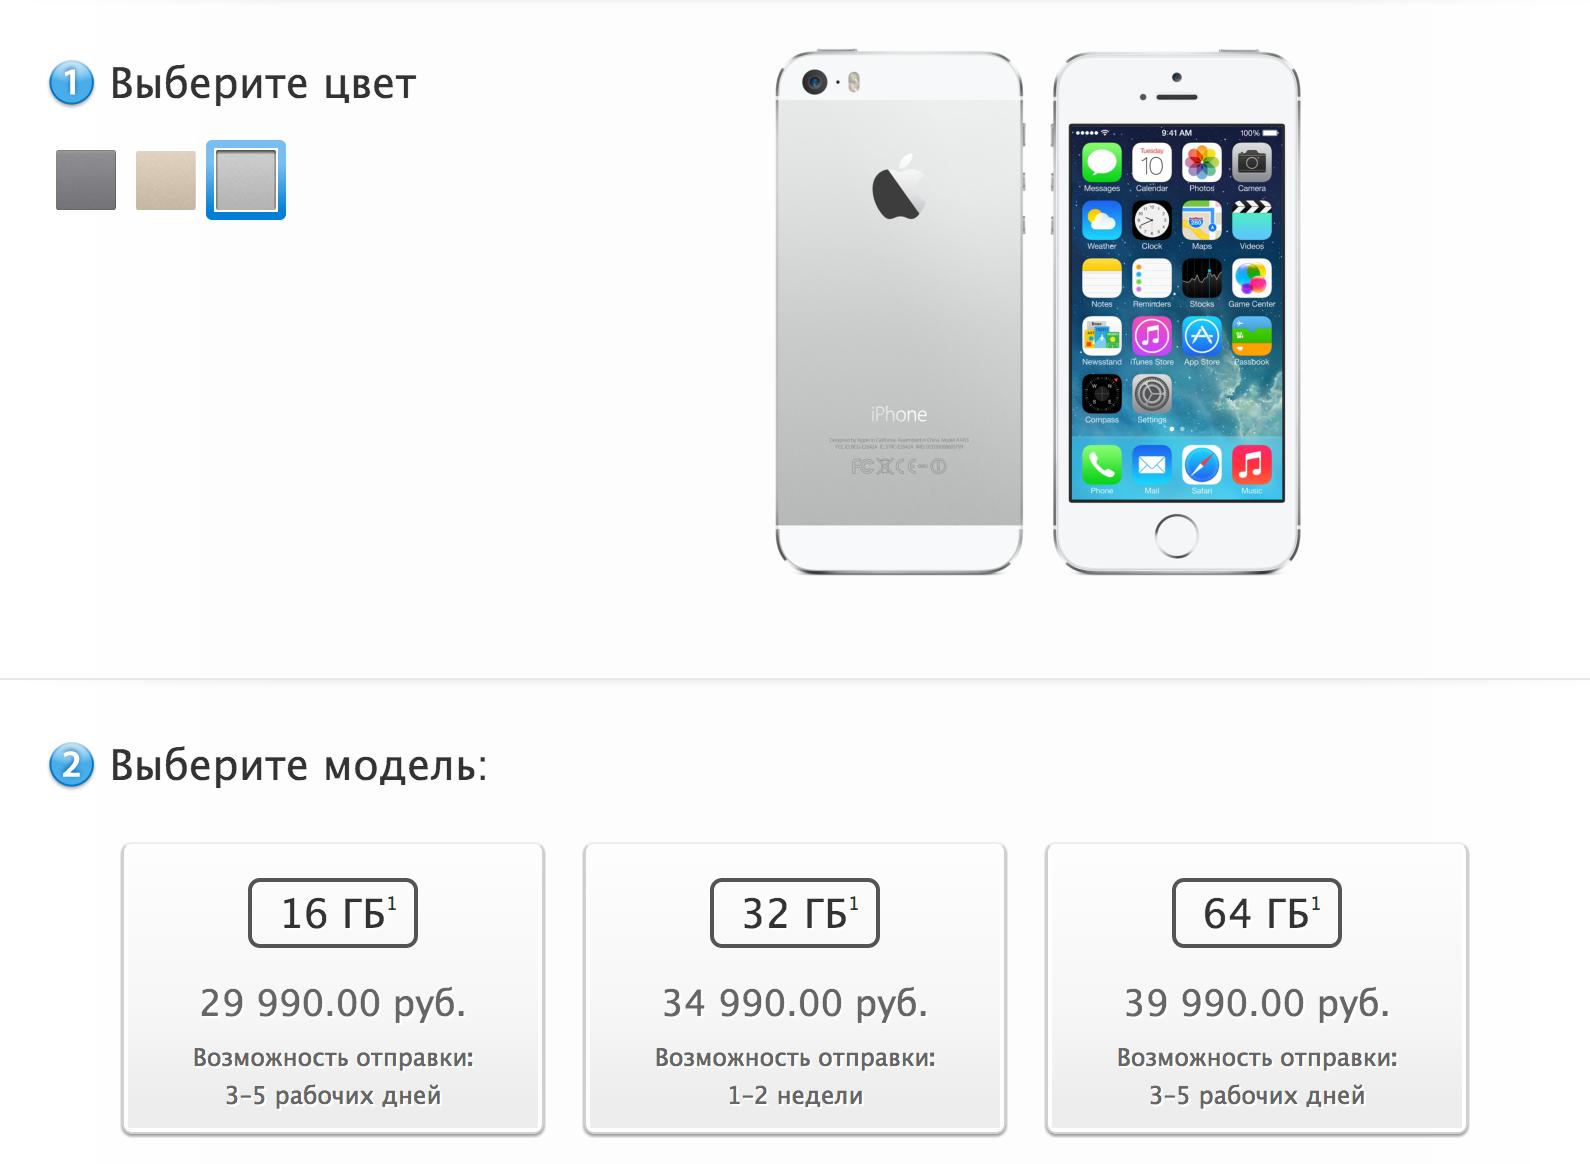 Дефицит на iPhone 5s понемногу падает